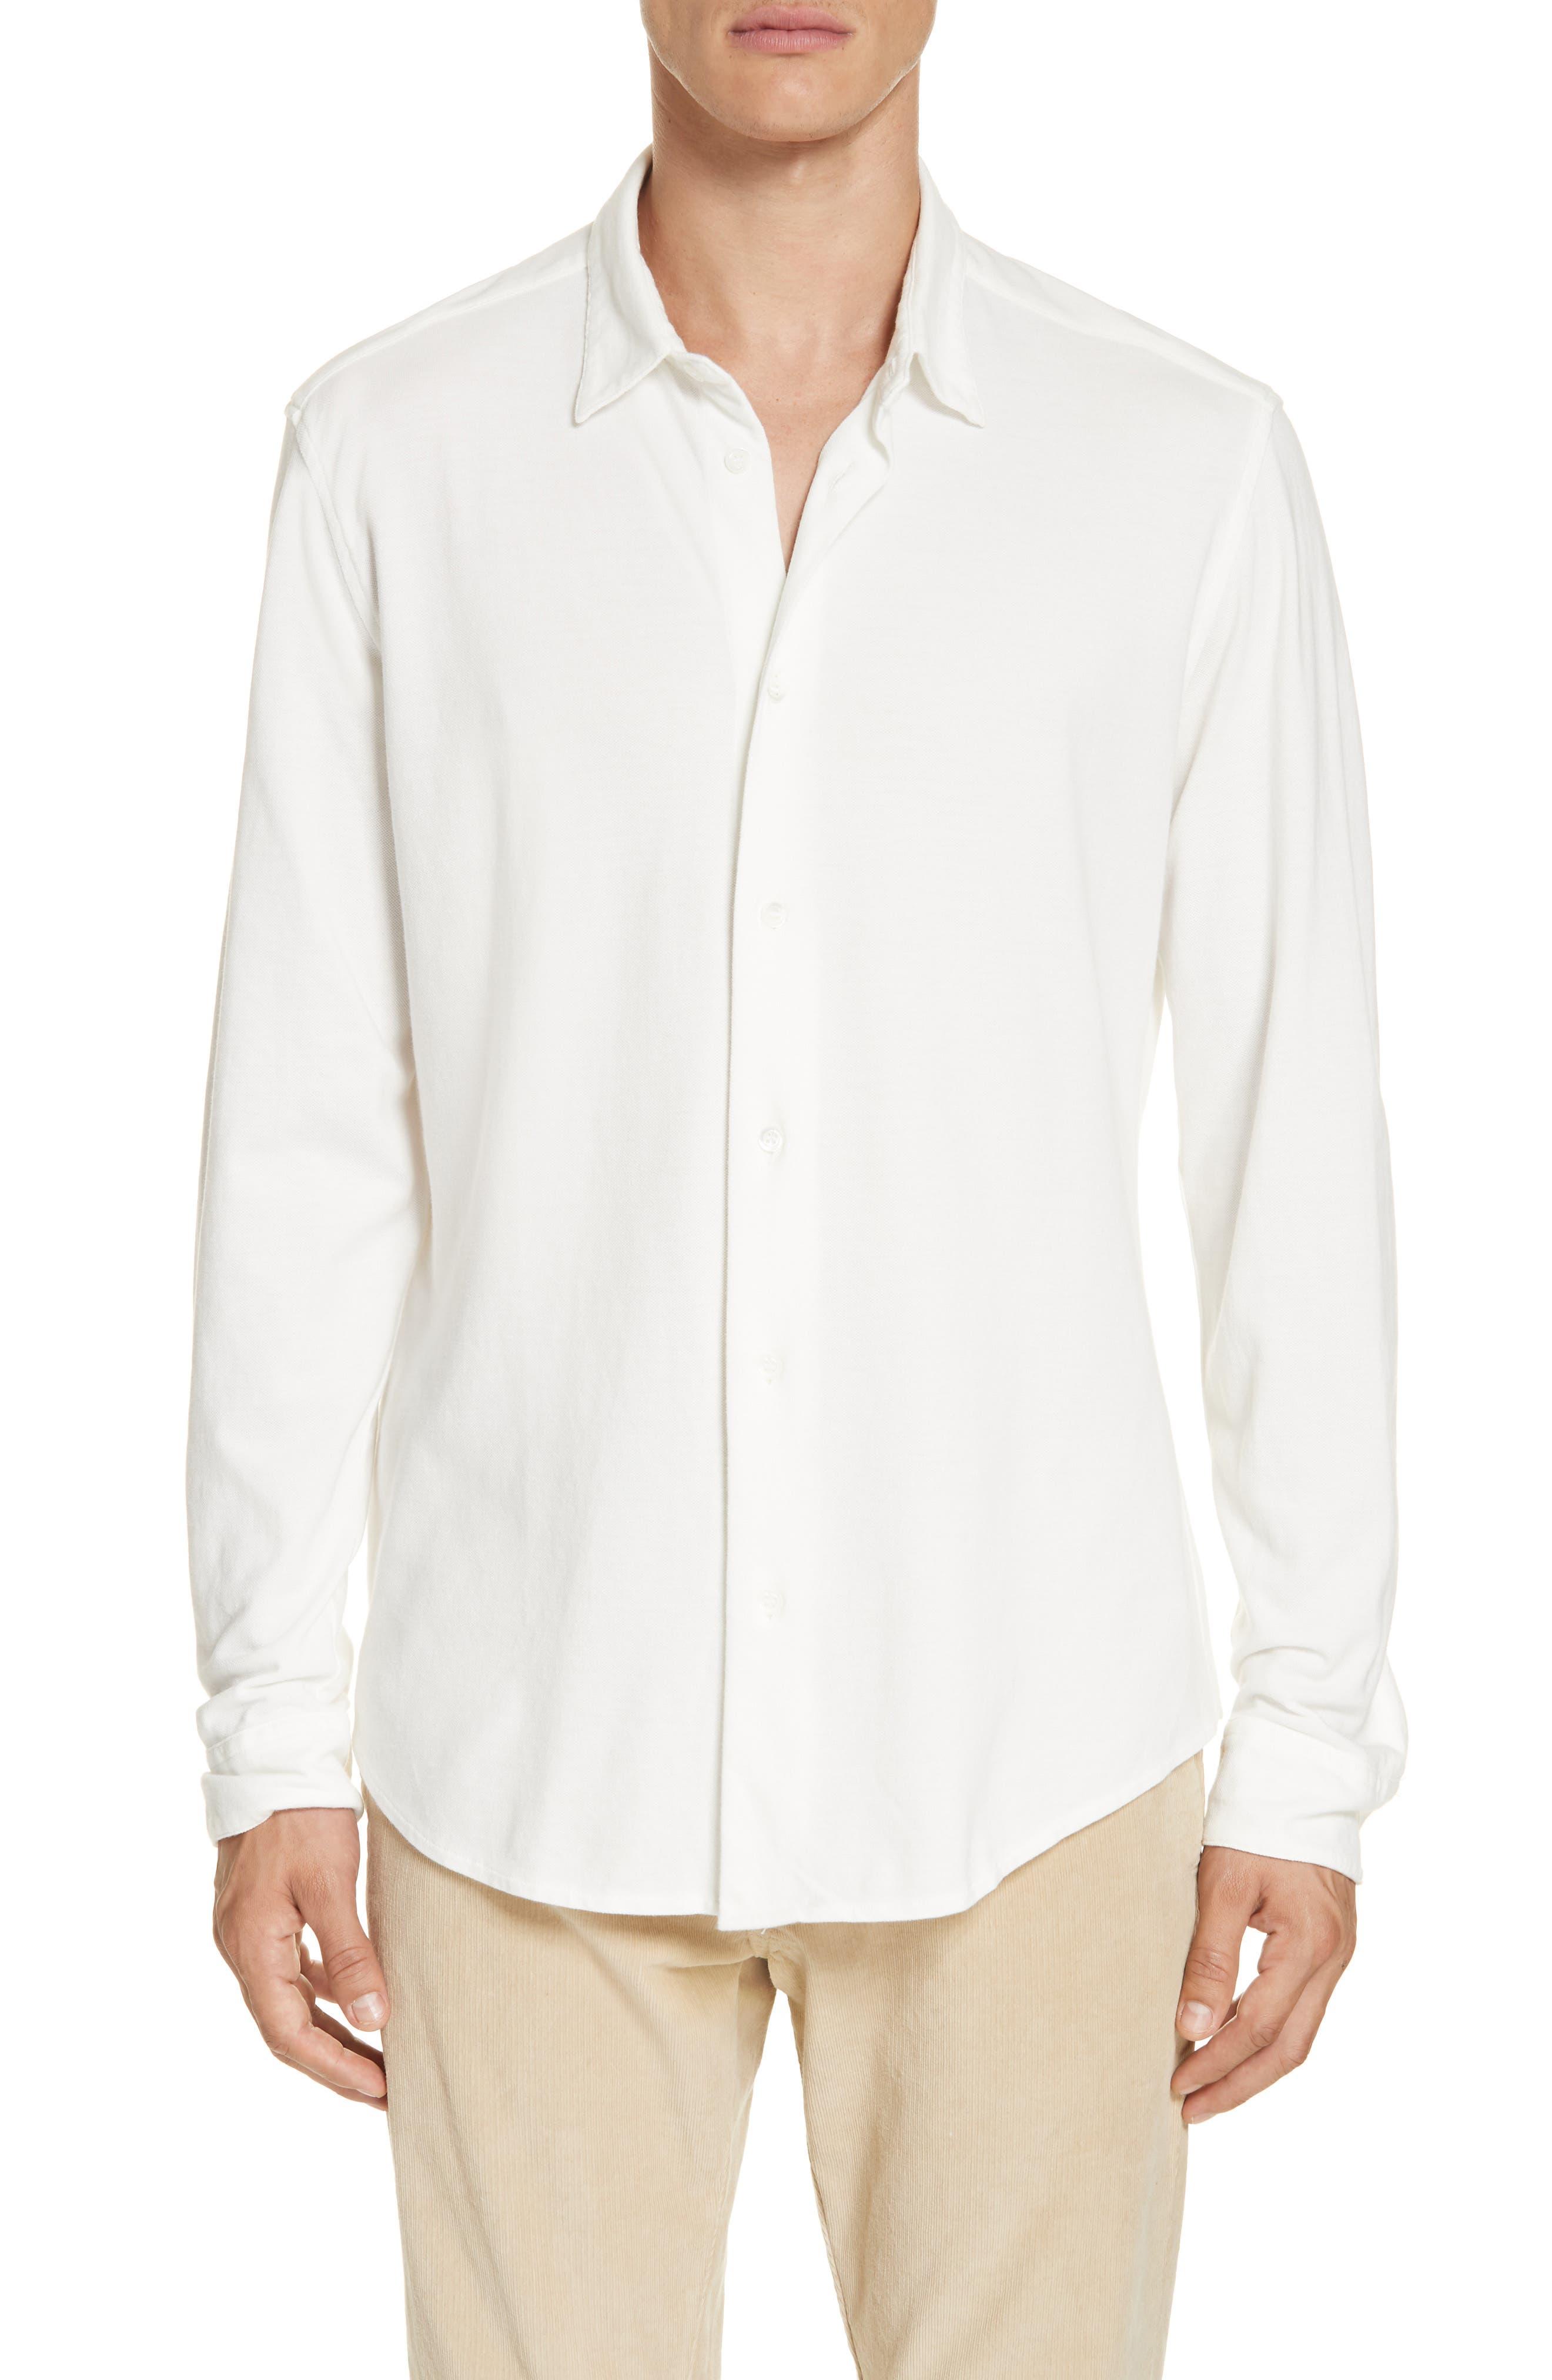 Coppi Tamiso Sport Shirt,                             Main thumbnail 1, color,                             WHITE